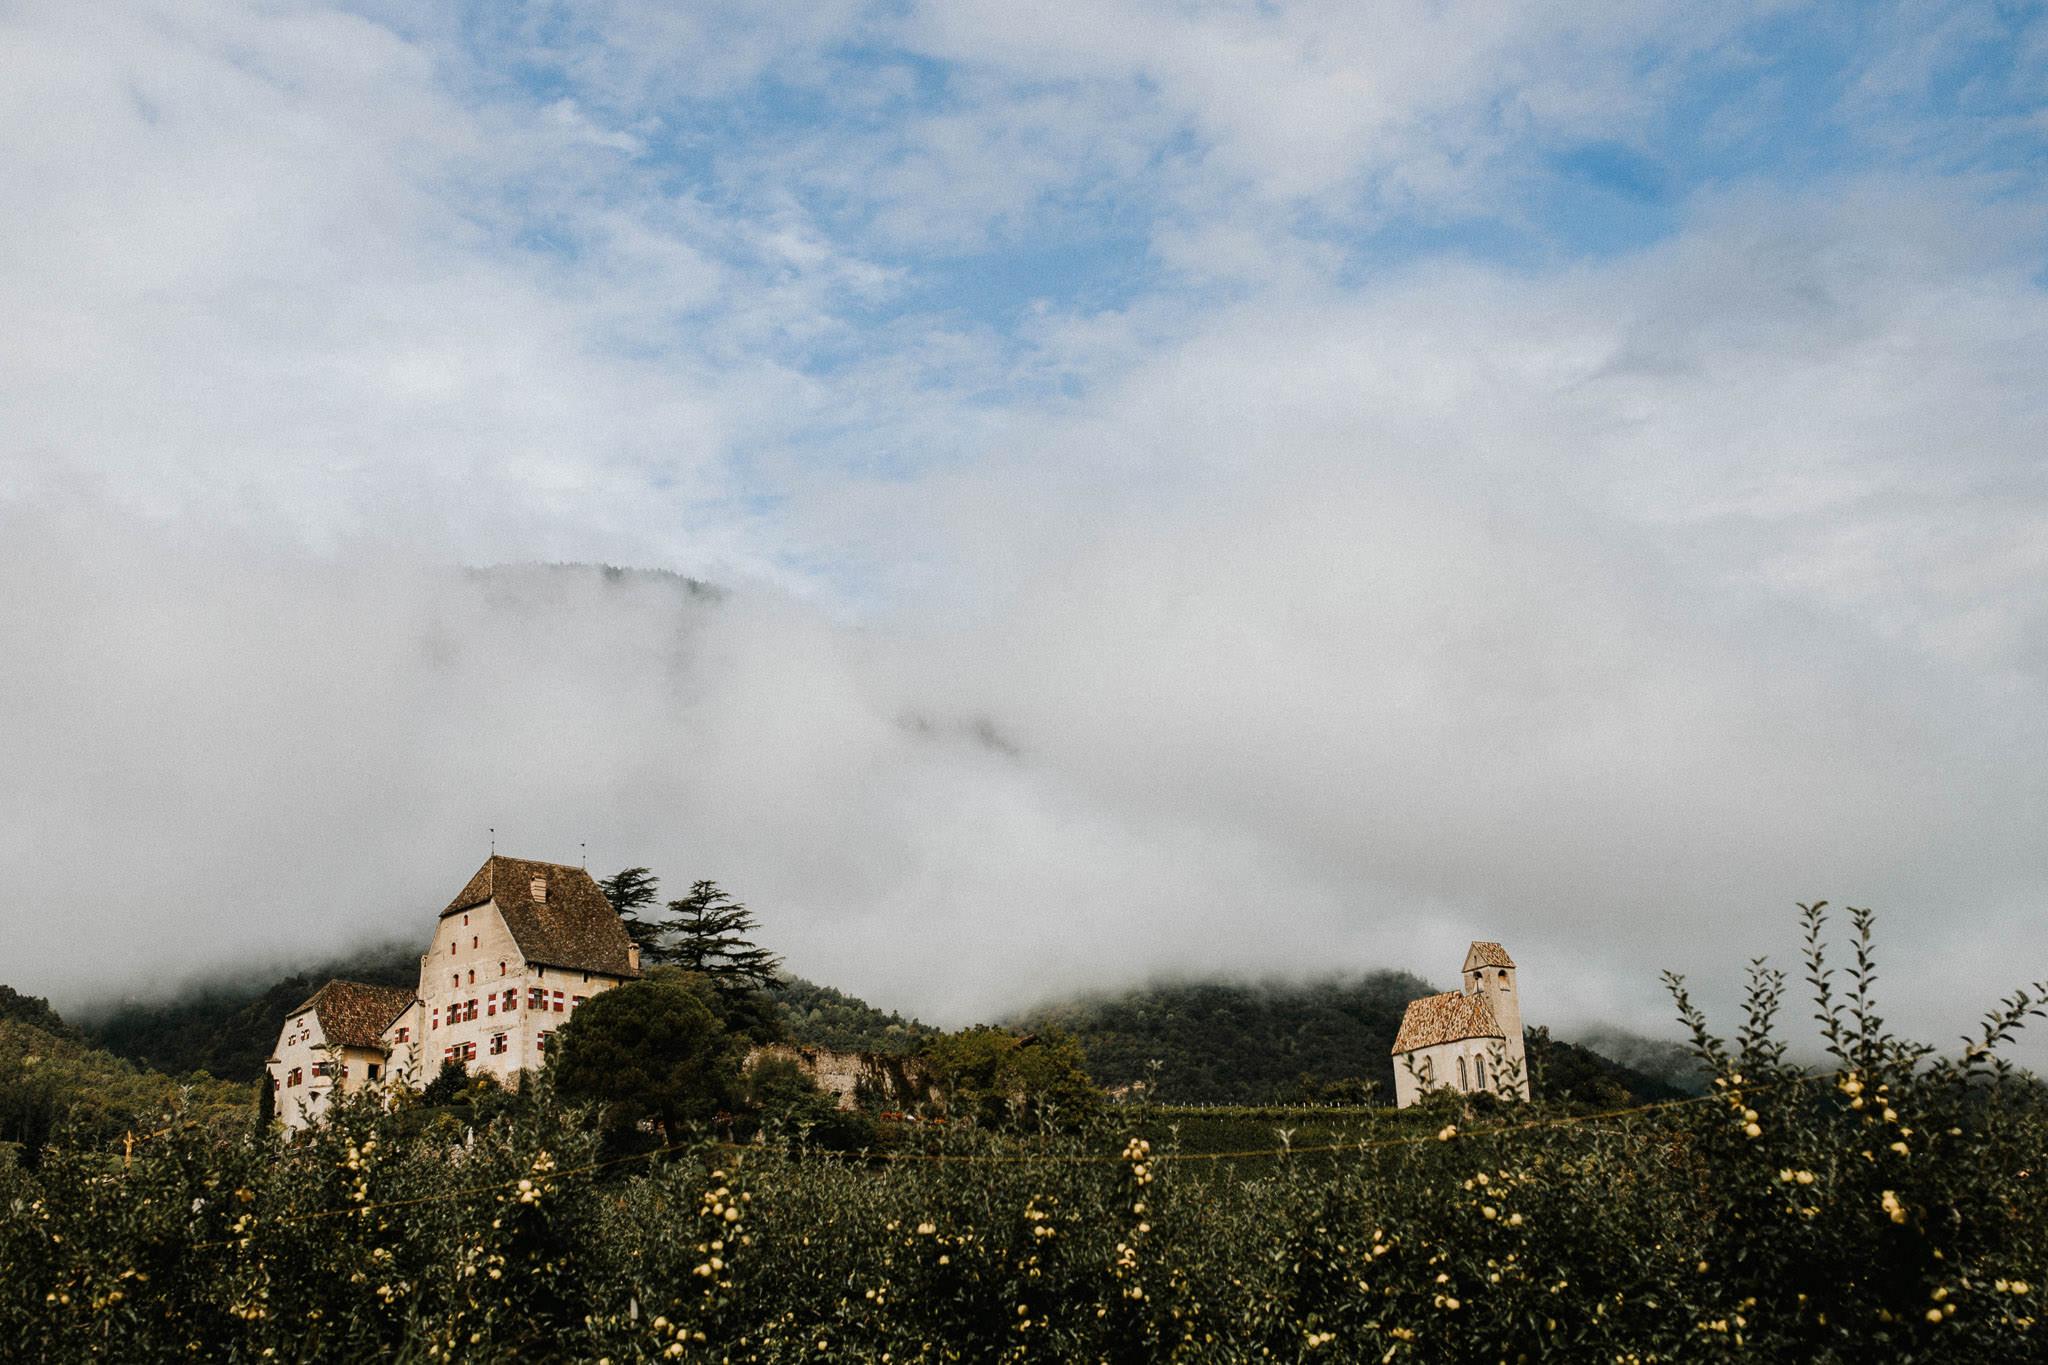 Hochzeit Schloss Englar in Eppan Bozen Südtirol